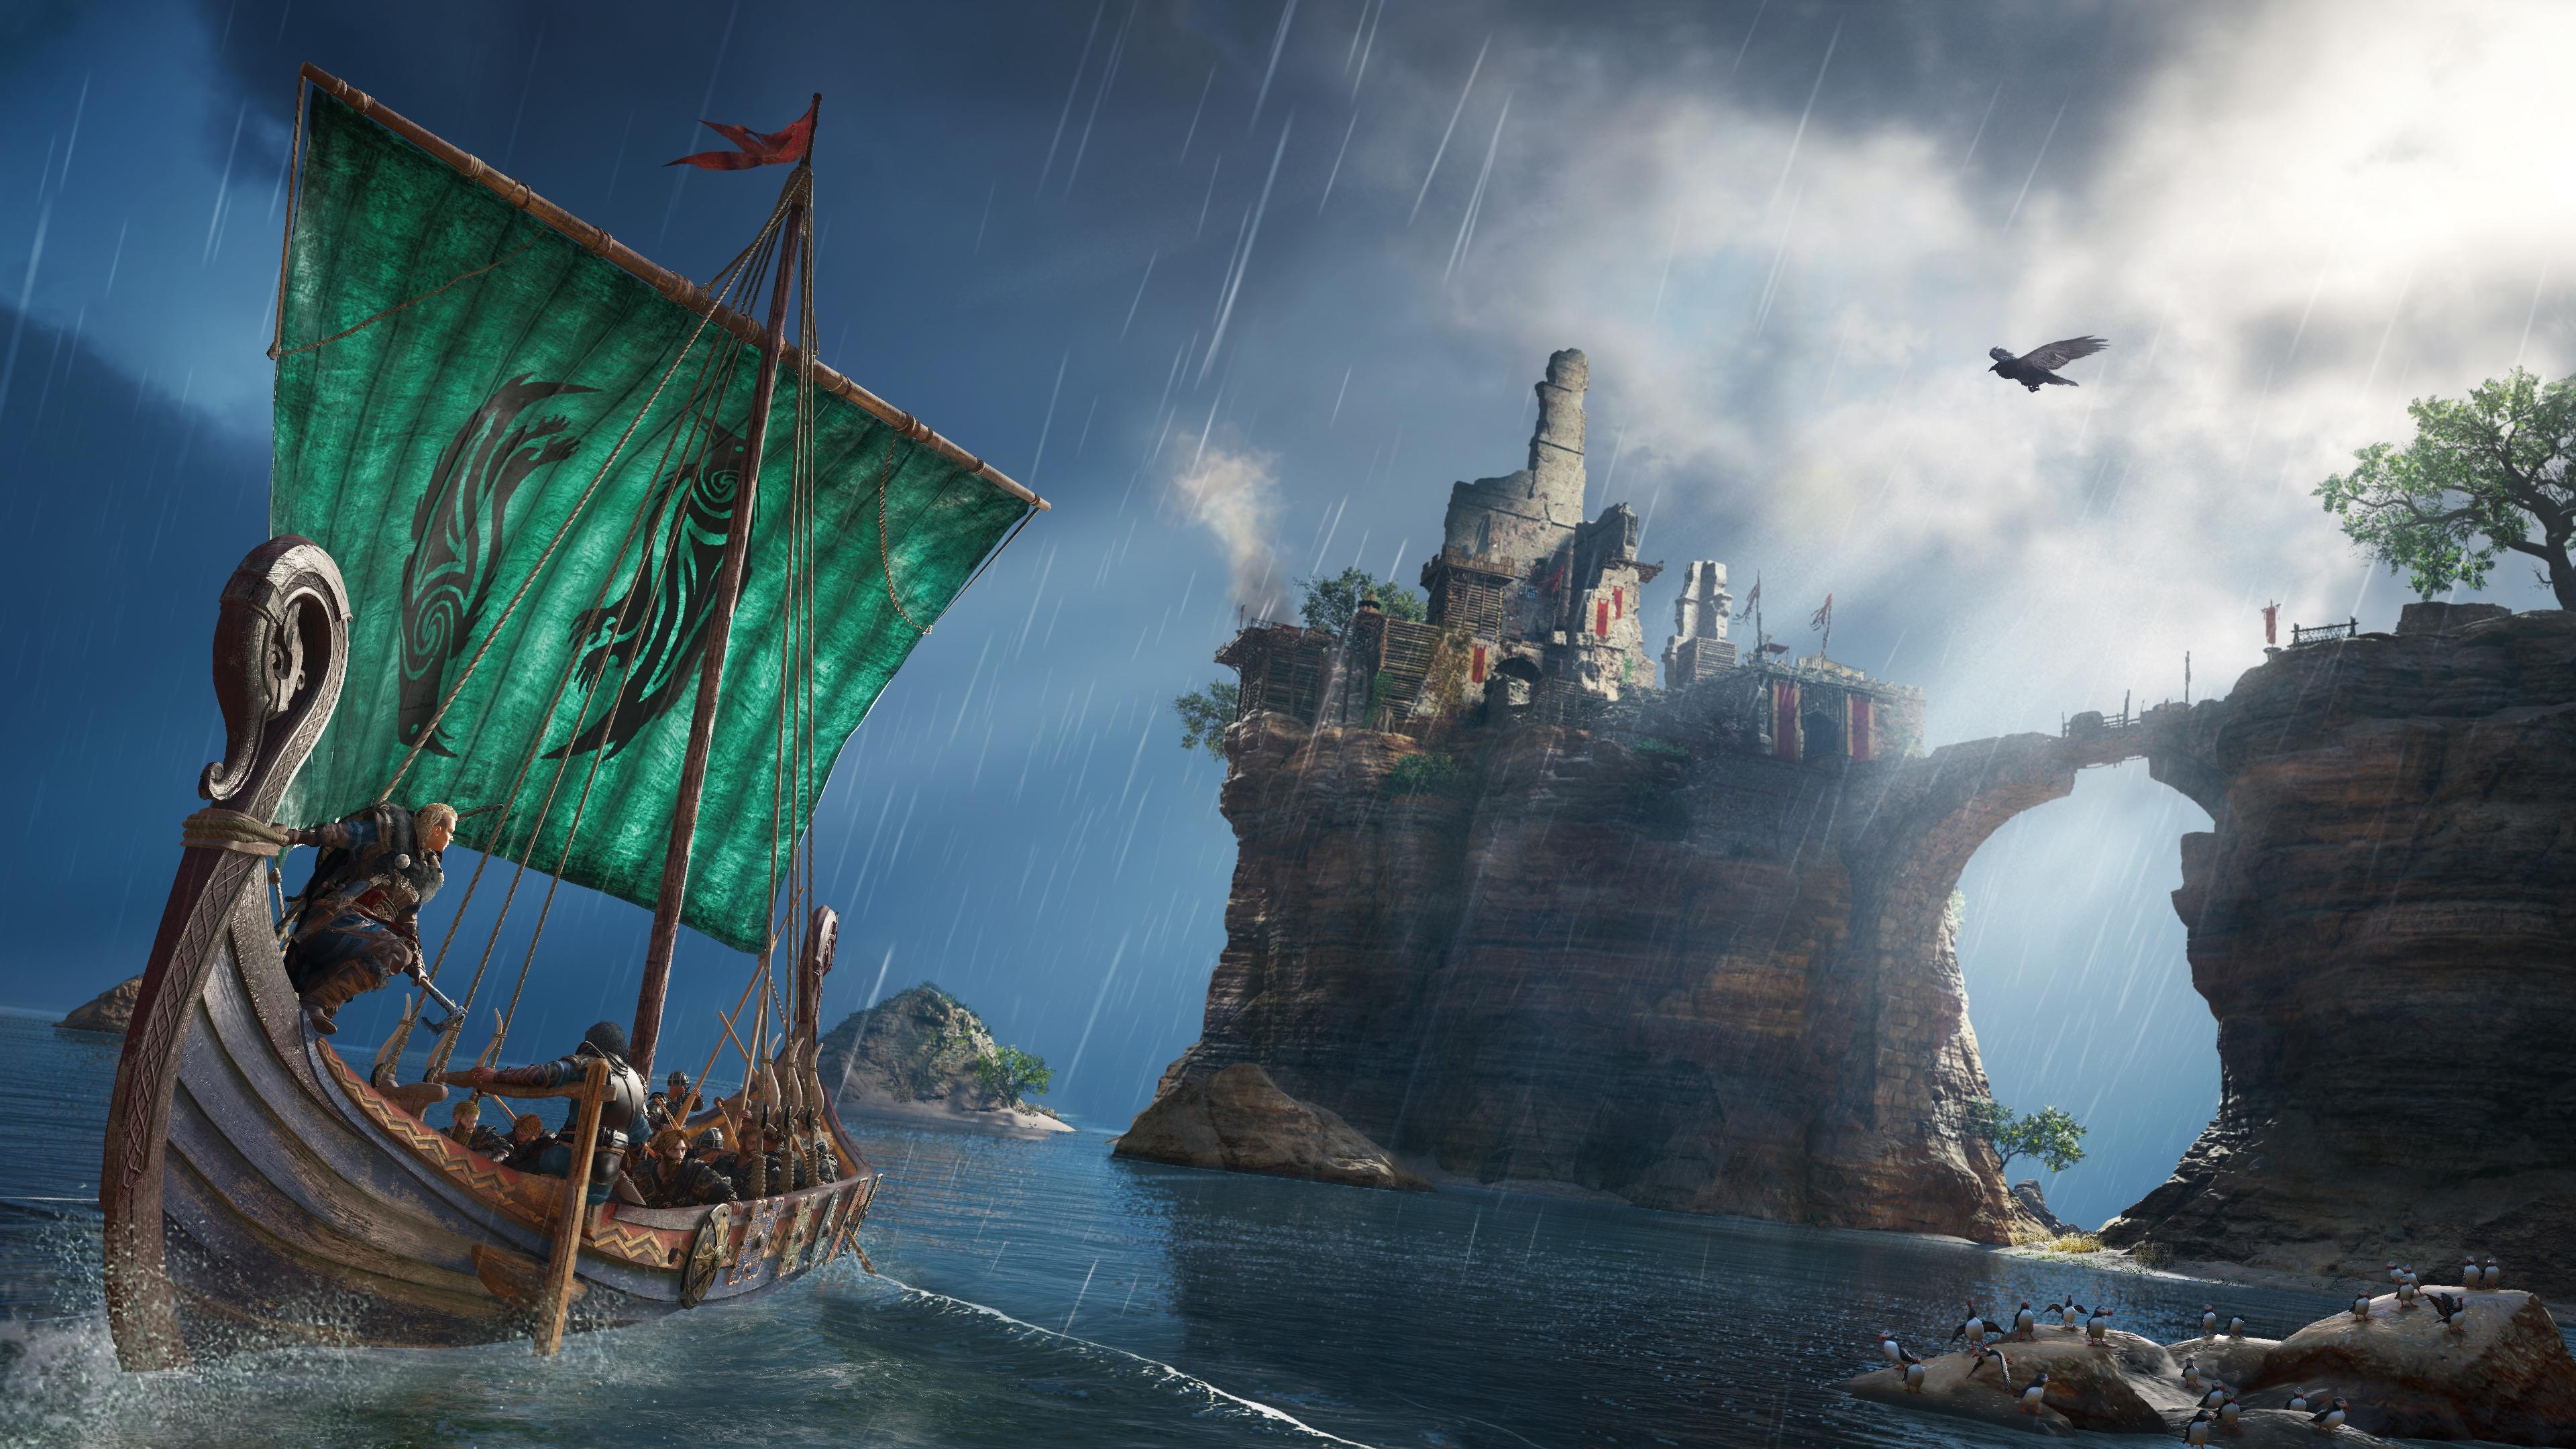 General 3840x2160 Assassin's Creed: Valhalla video games video game art digital art viking Axe boat raven